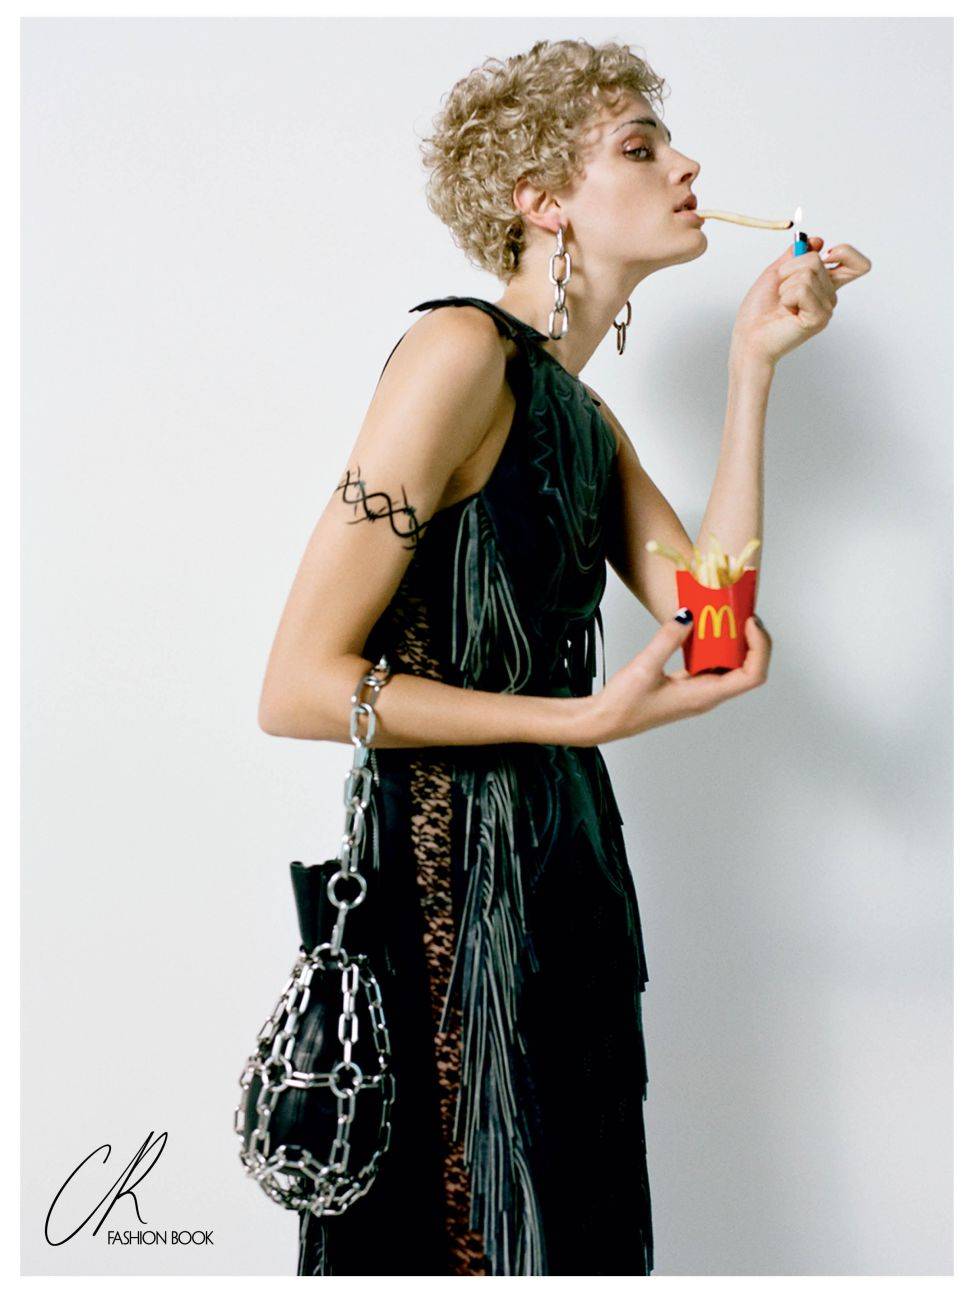 Carine Roitfeld Celebrates the American Girl in CR Fashion Book